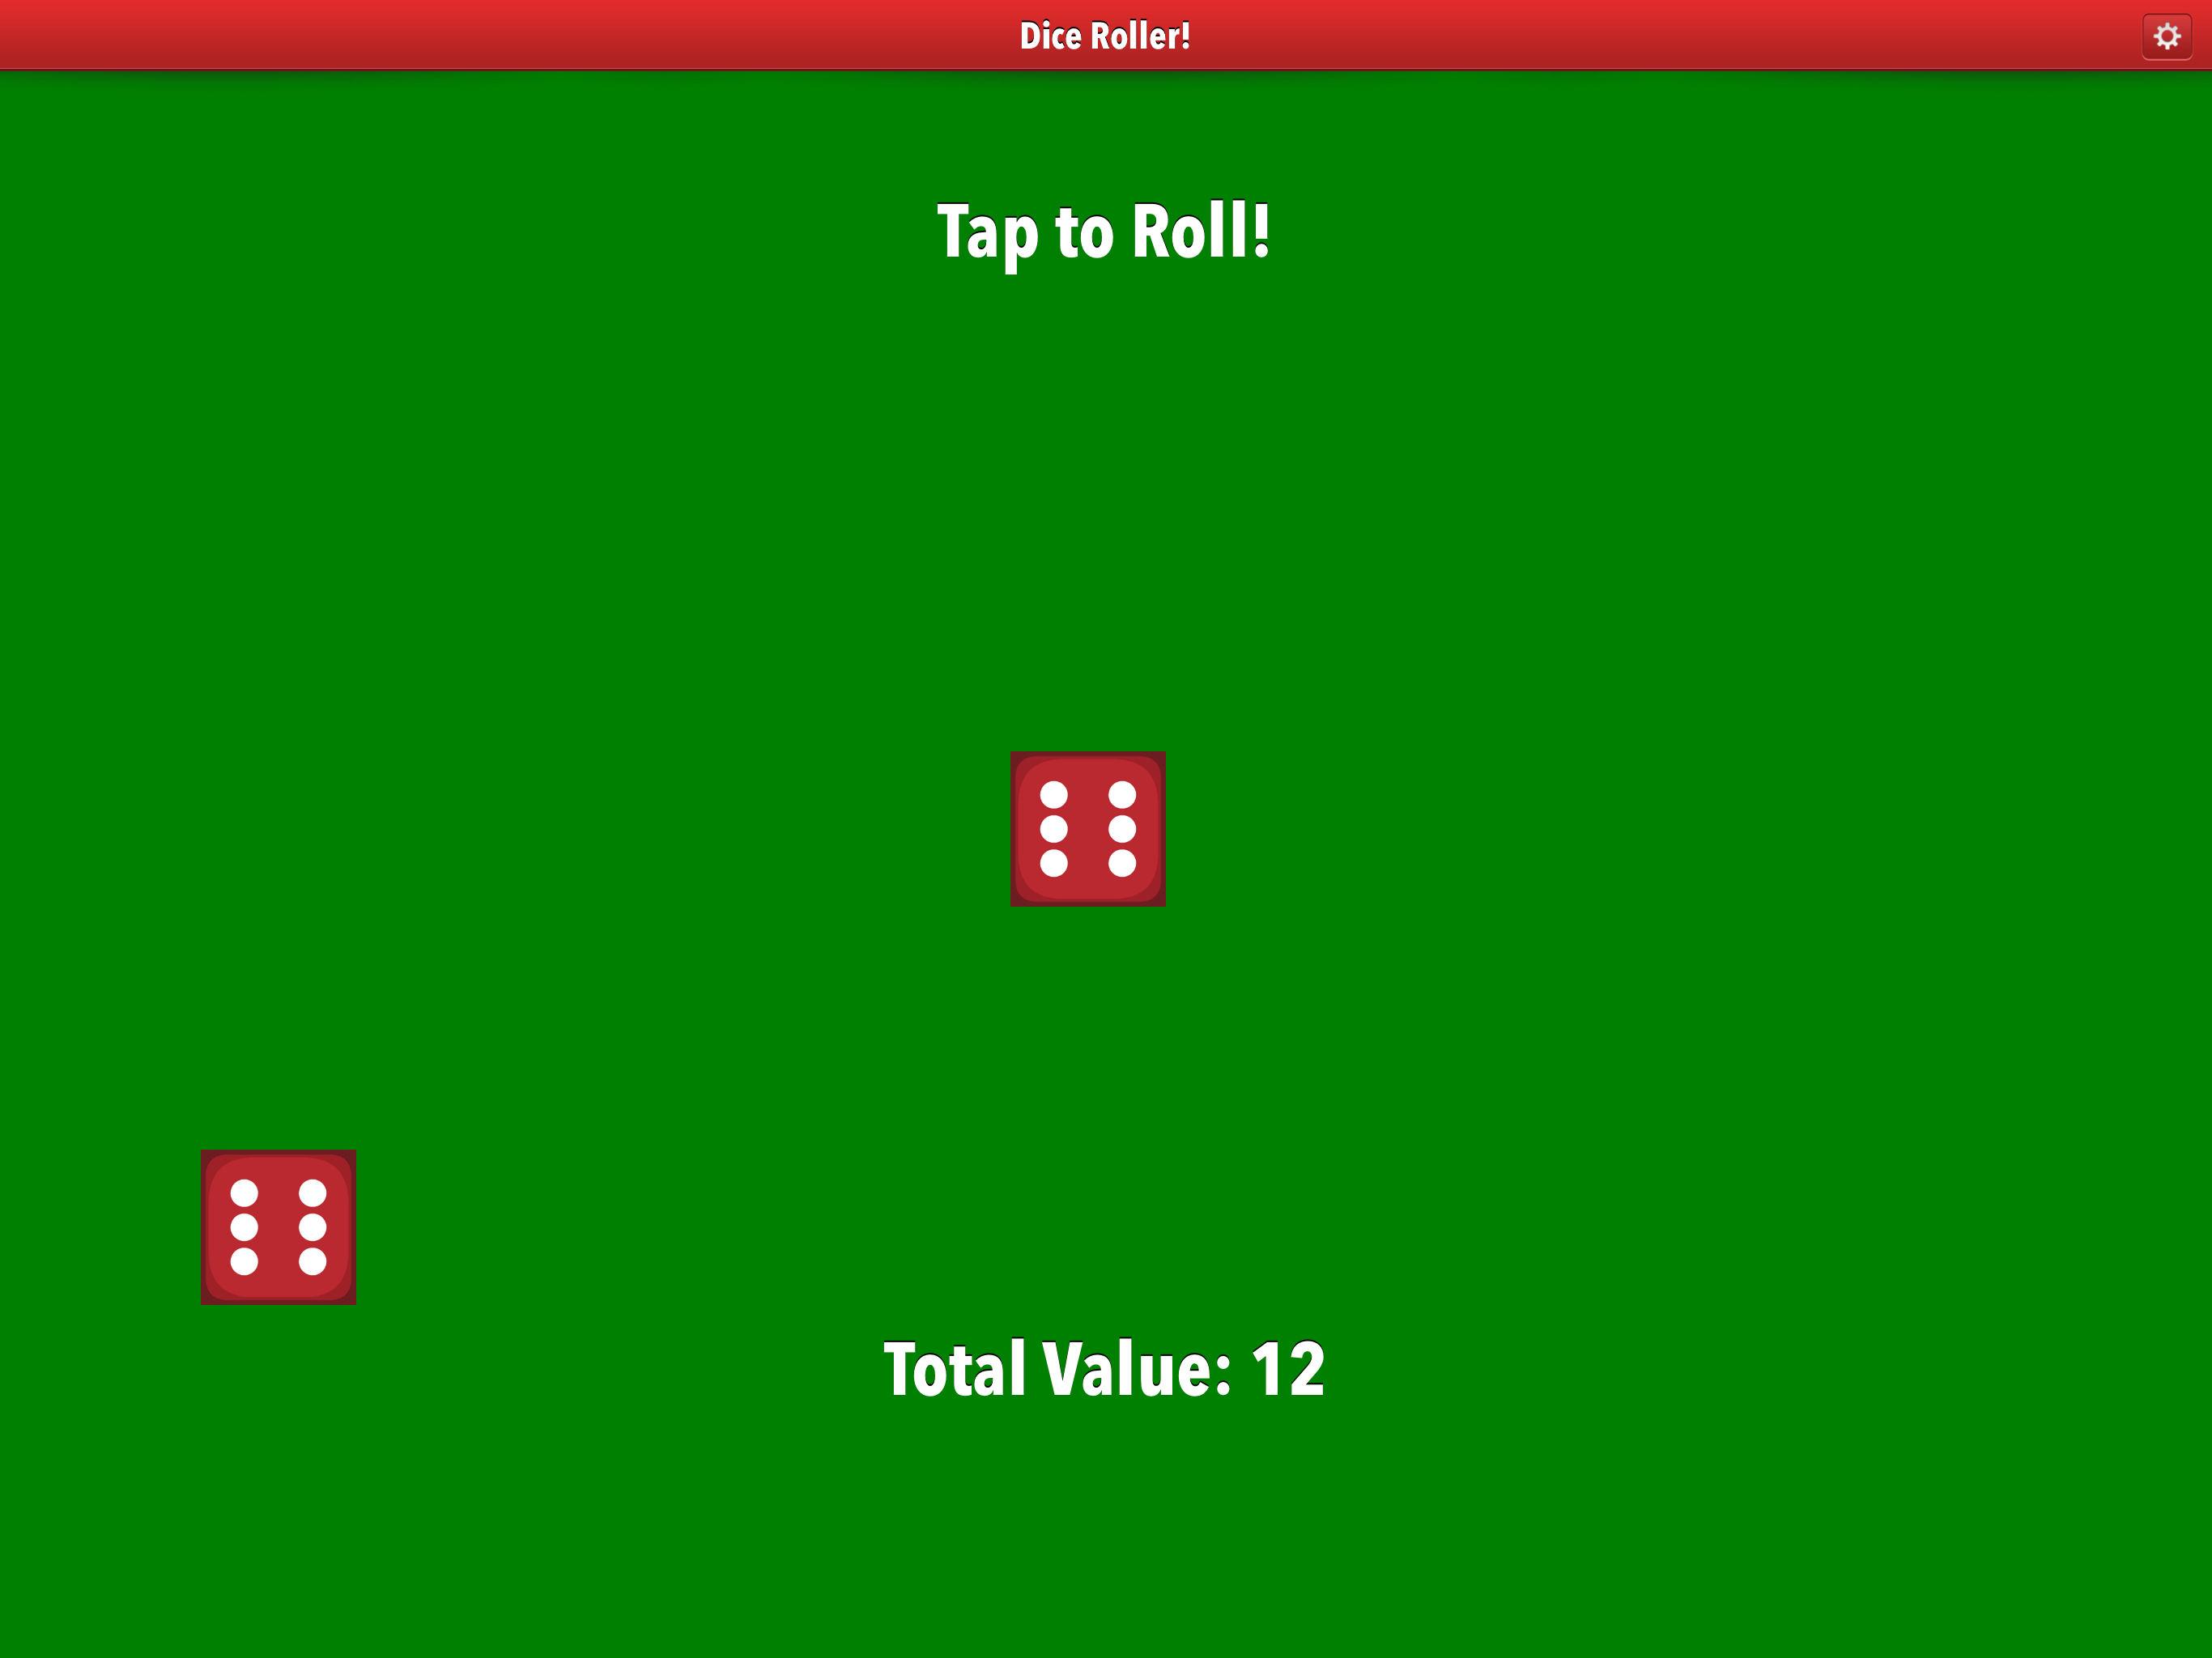 Dice Roller App iPad Pro screenshot two dice.